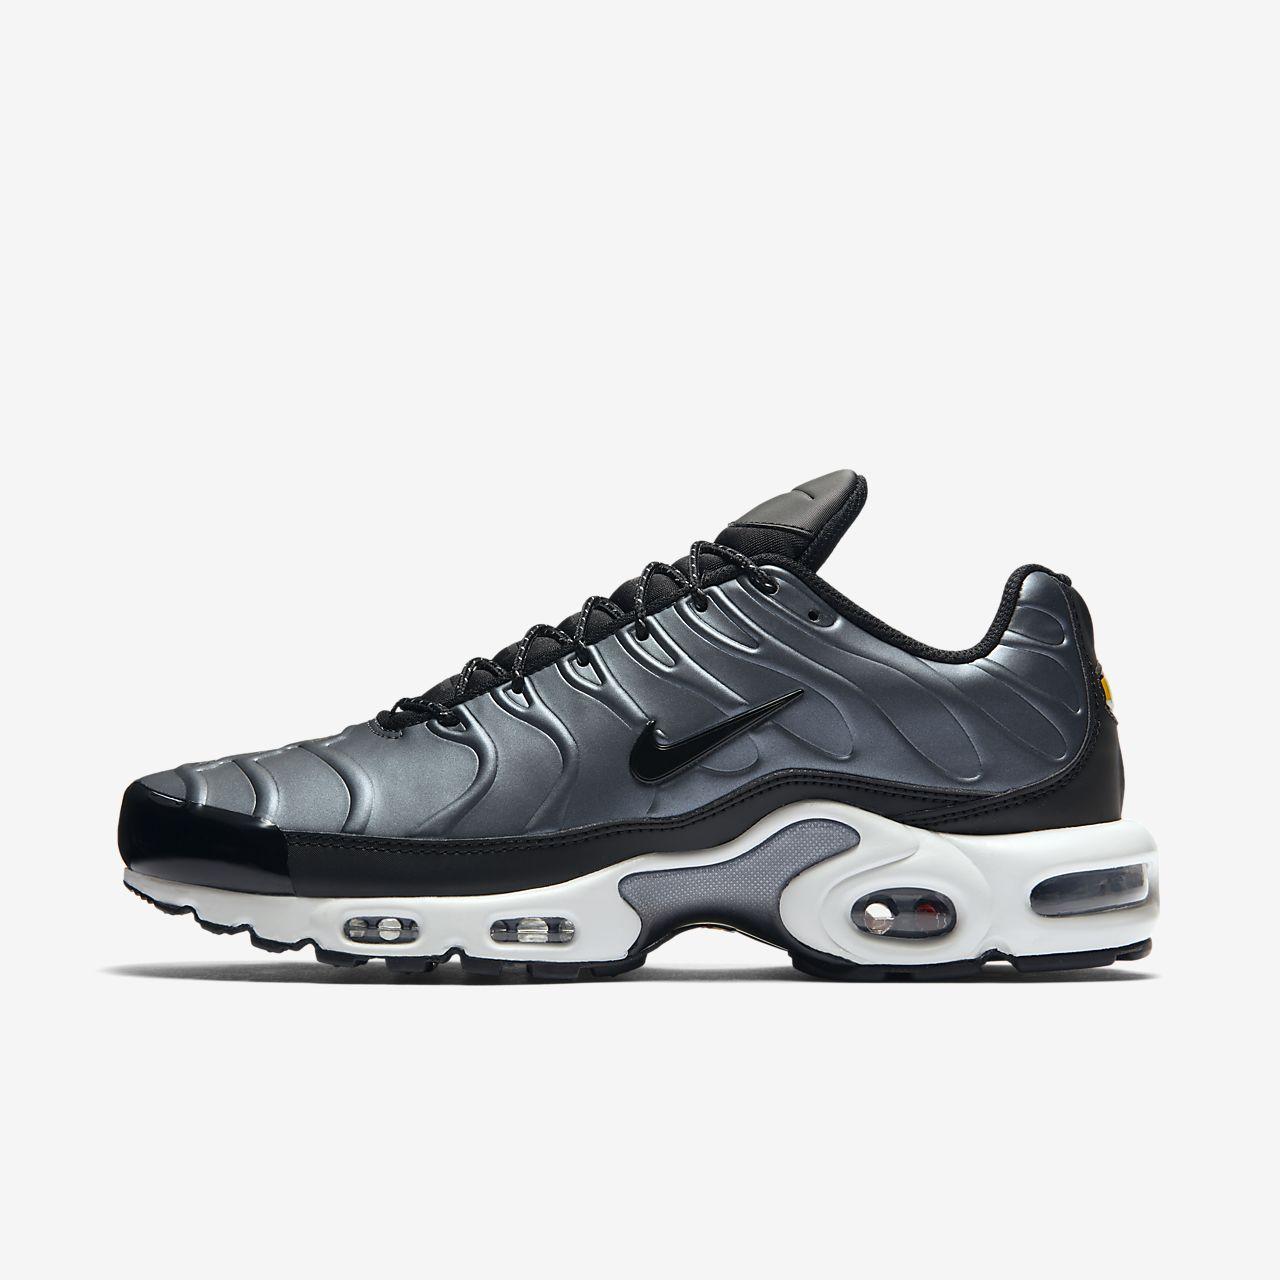 san francisco fb189 e08d8 ... Sko Nike Air Max Plus SE för män